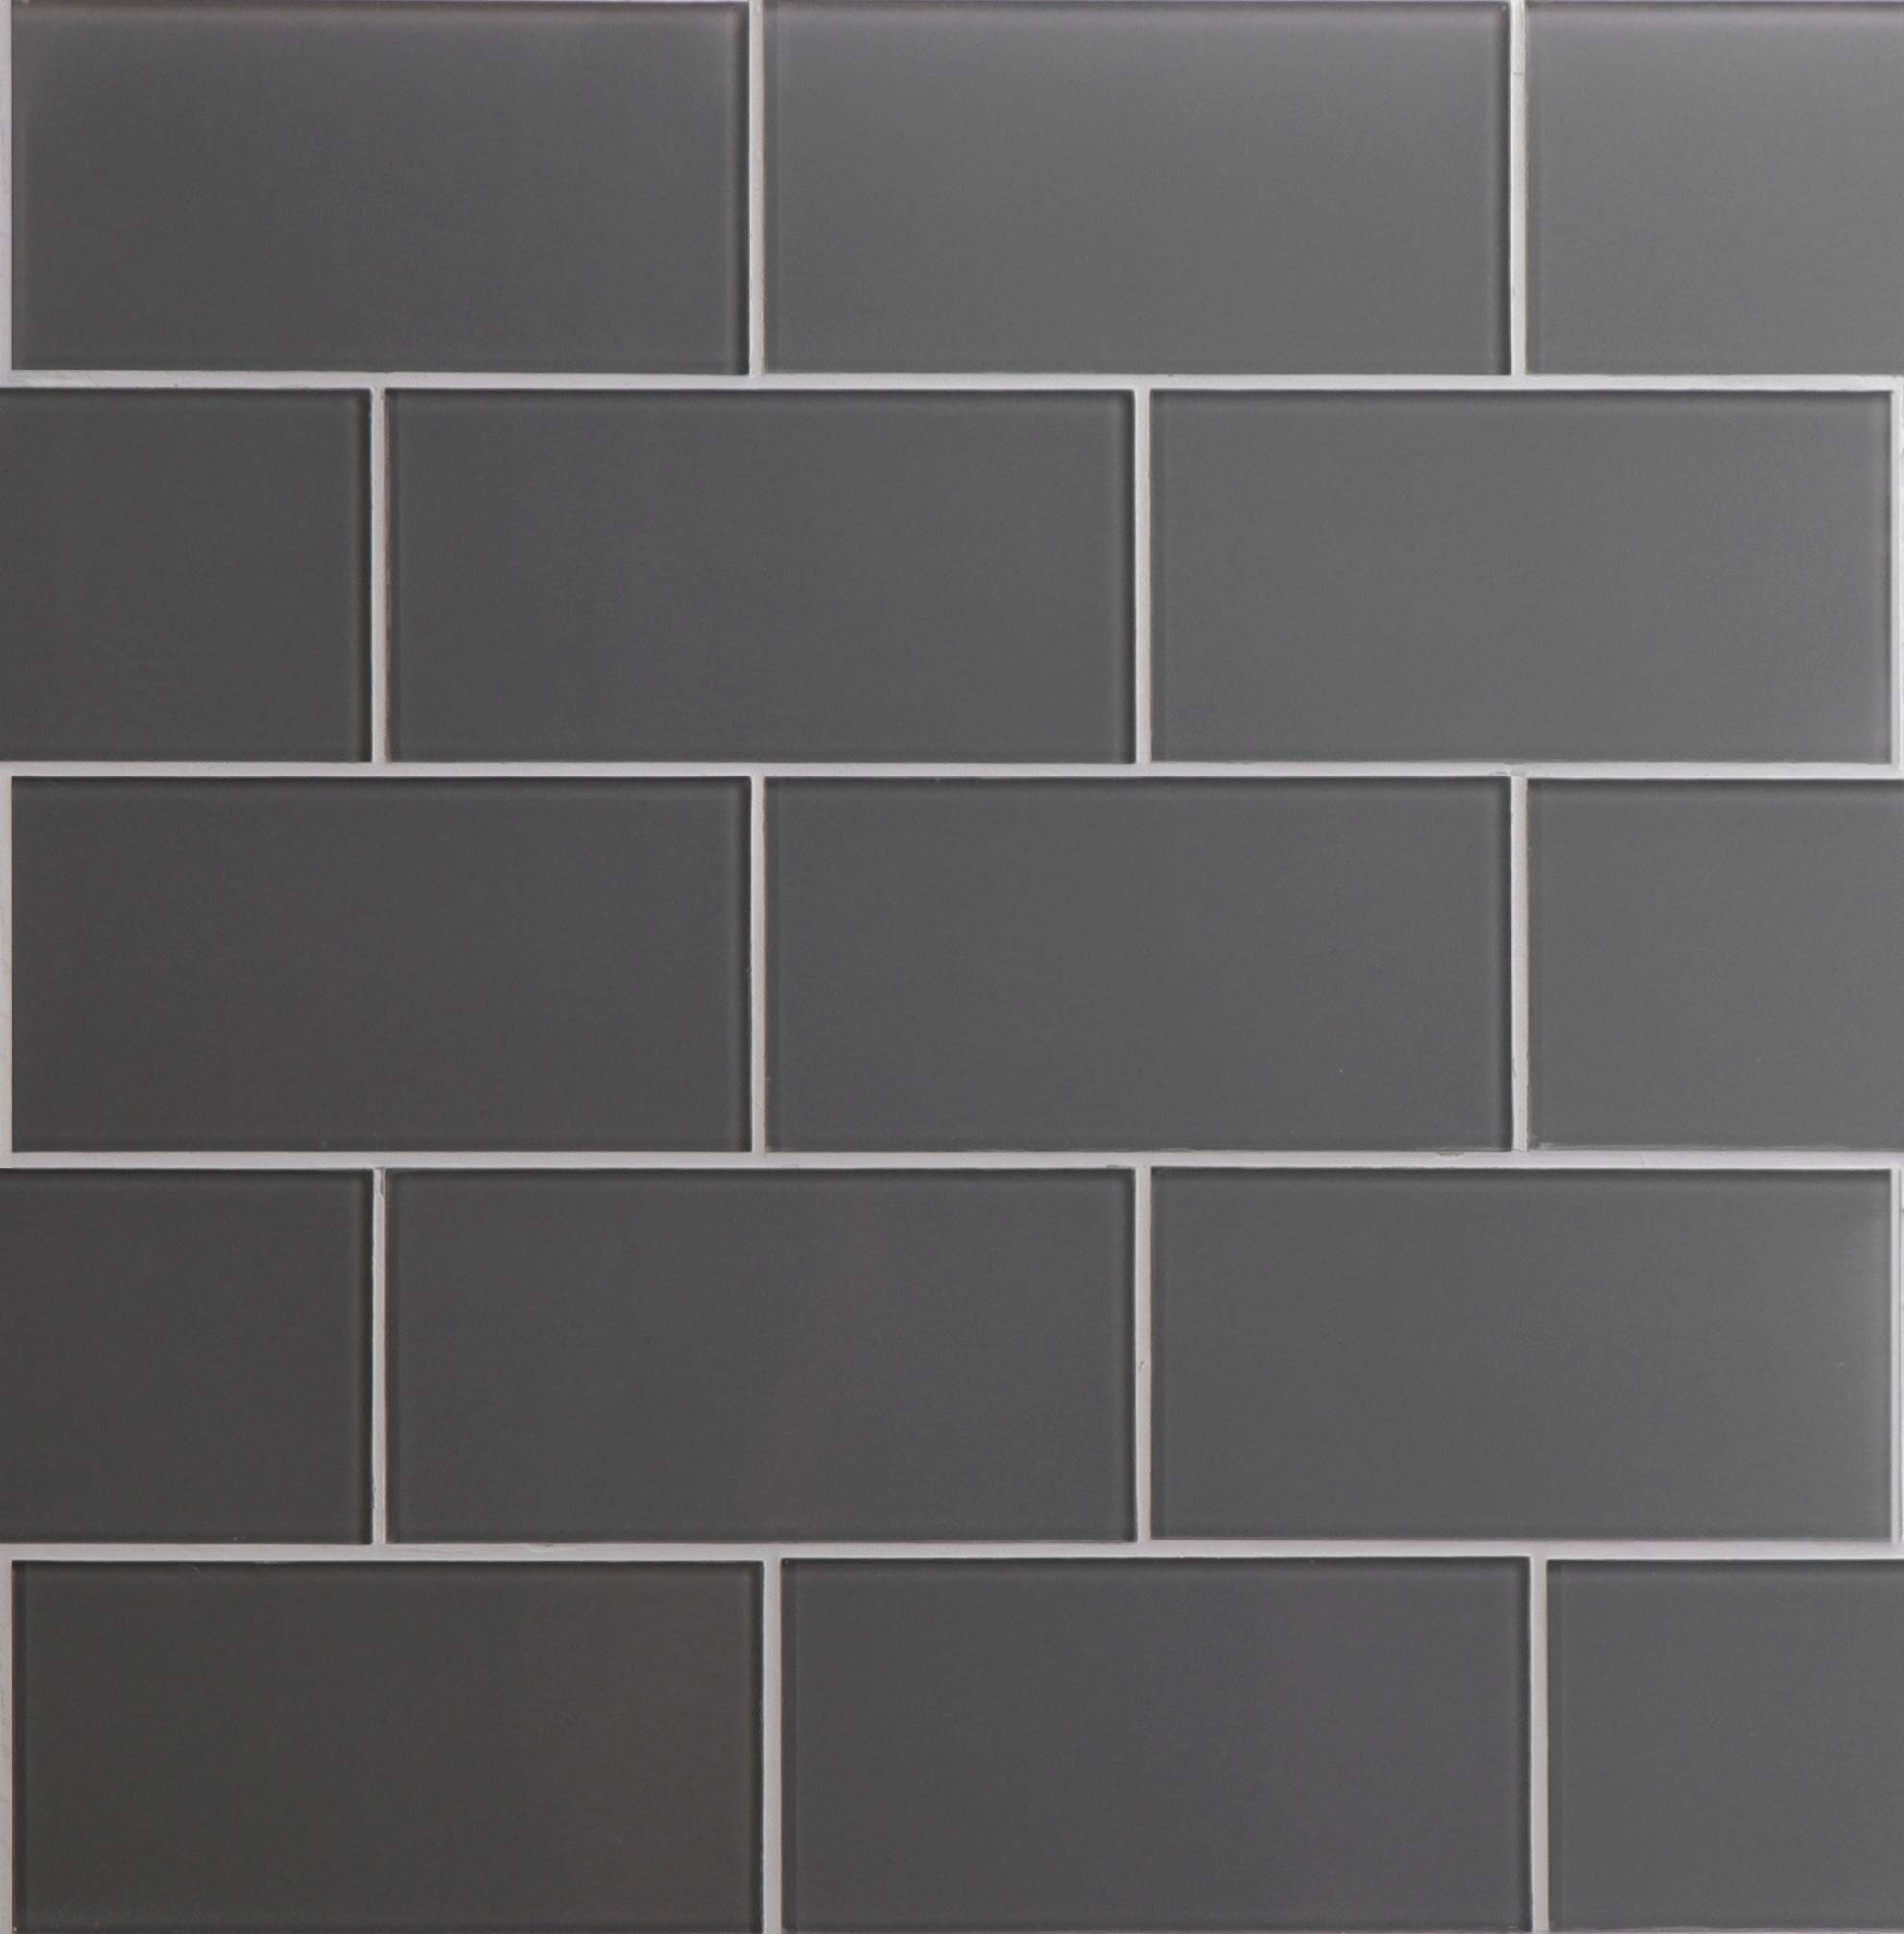 Glass Subway Backsplash Tile Kolors Series in Dark Gray for Kitchen and Bathroom by WS Tiles - WST-02C - 40 Tiles (3'' x 6'' Mosaic 5 SqFt, Dark Gray)